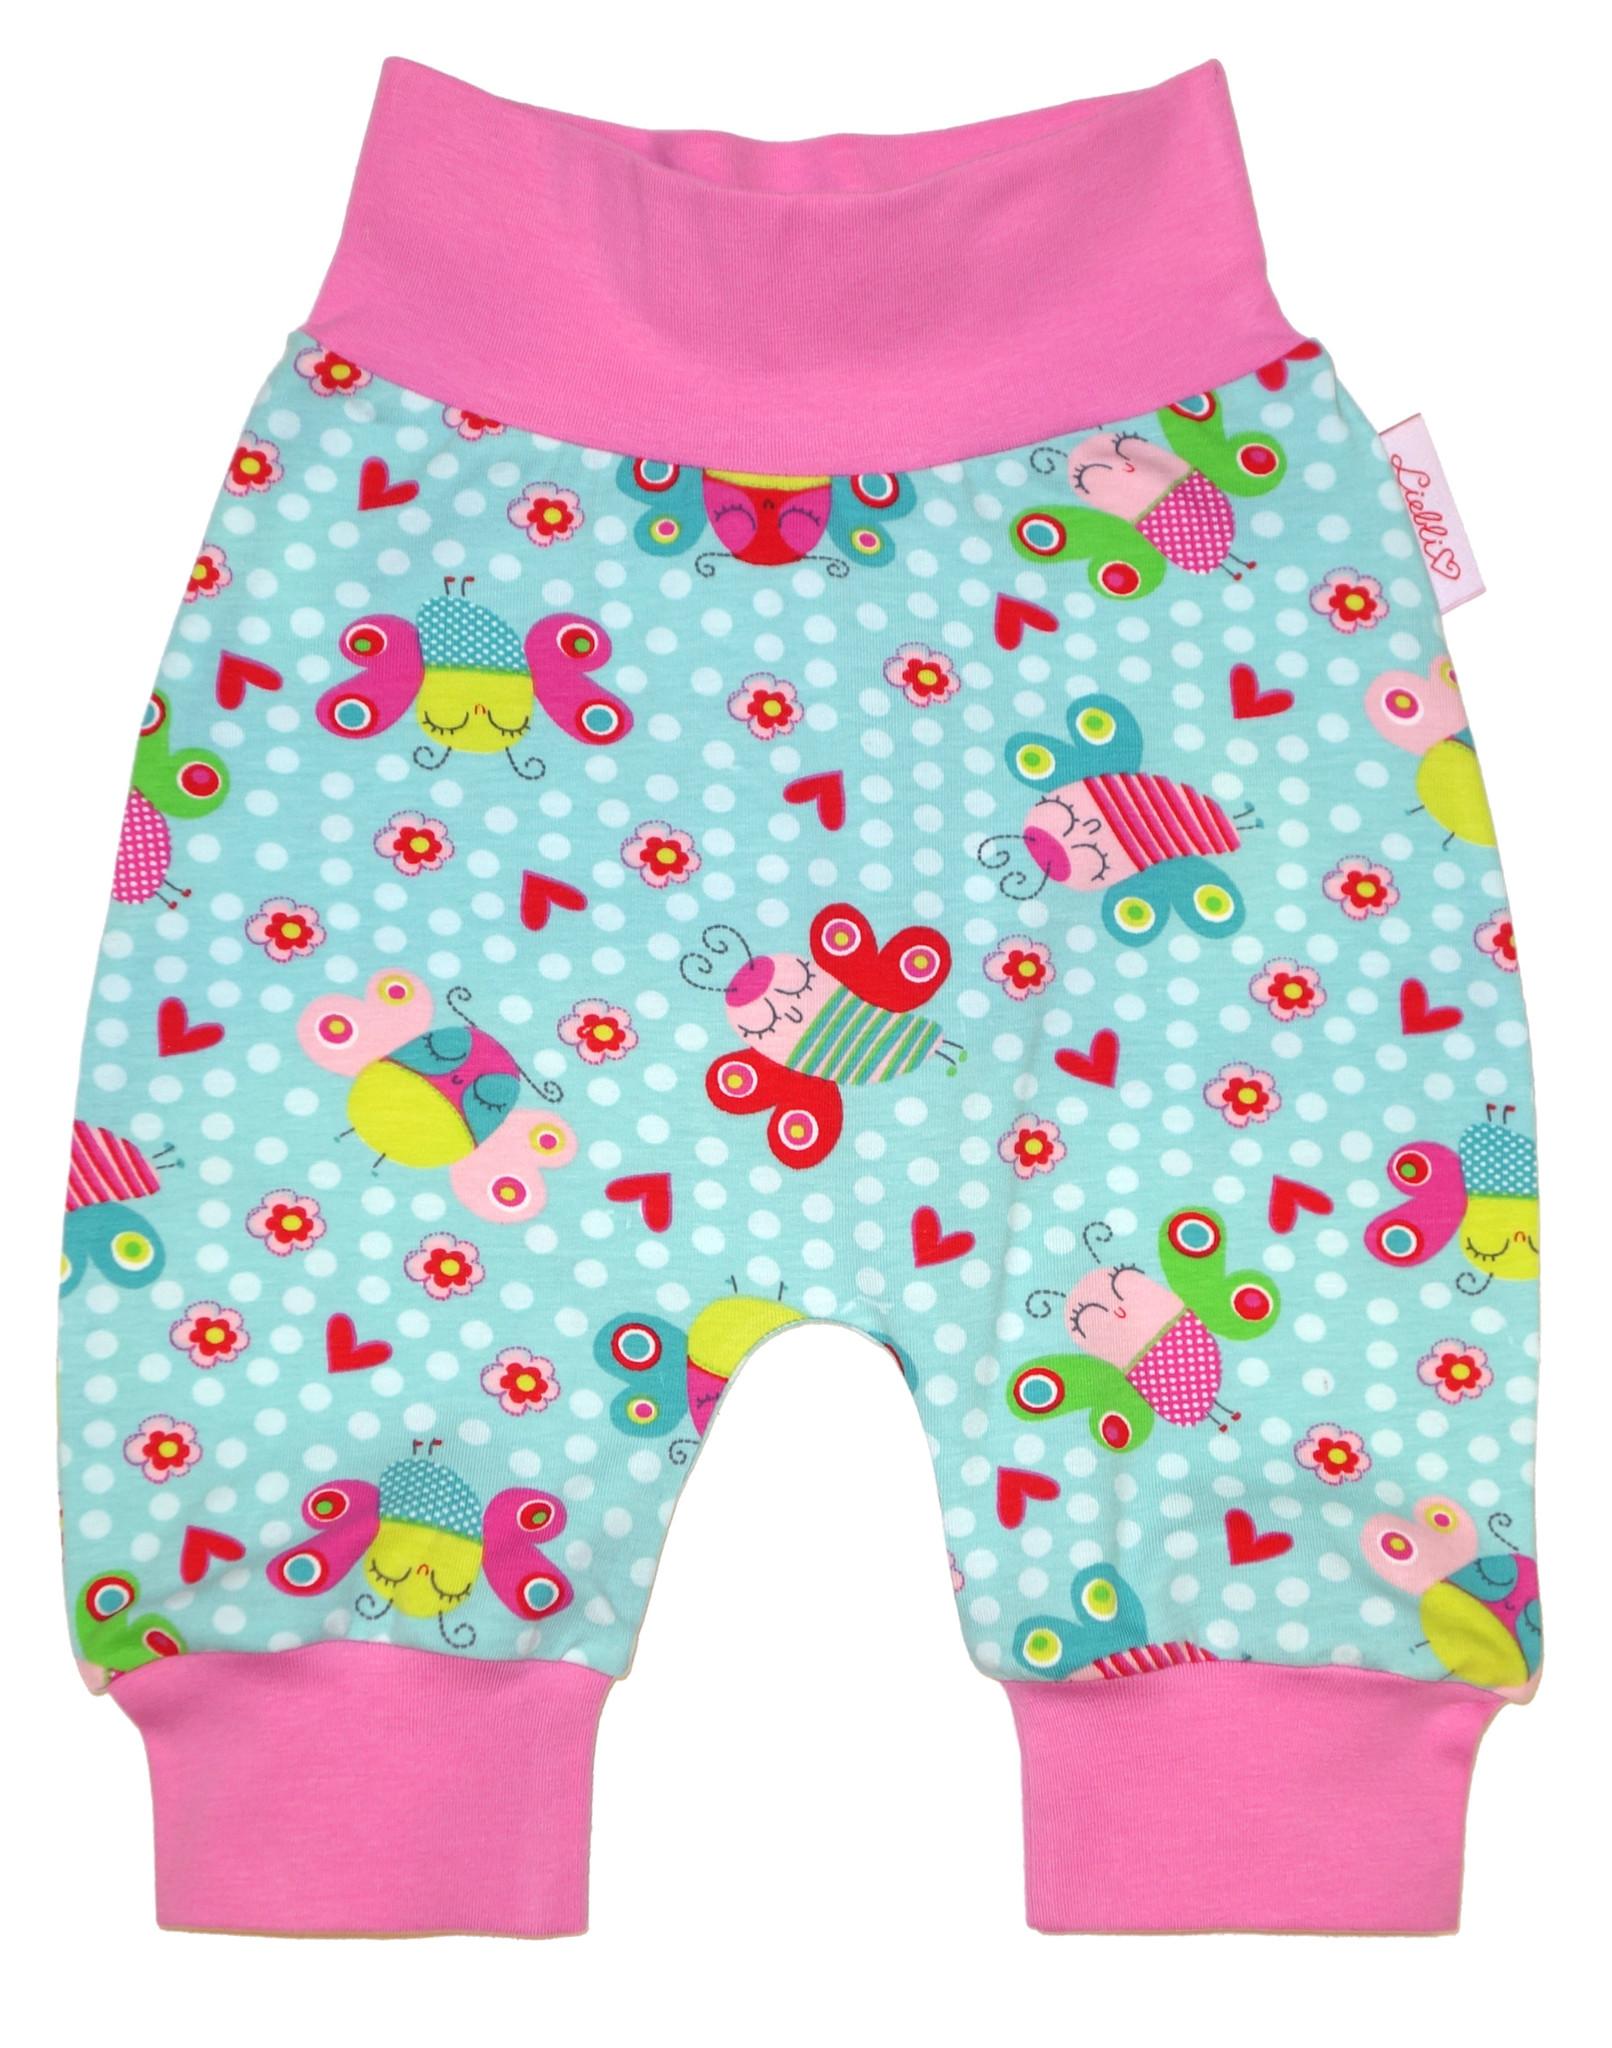 Babyhose / Pumphose, Schmetterlinge mint rosa